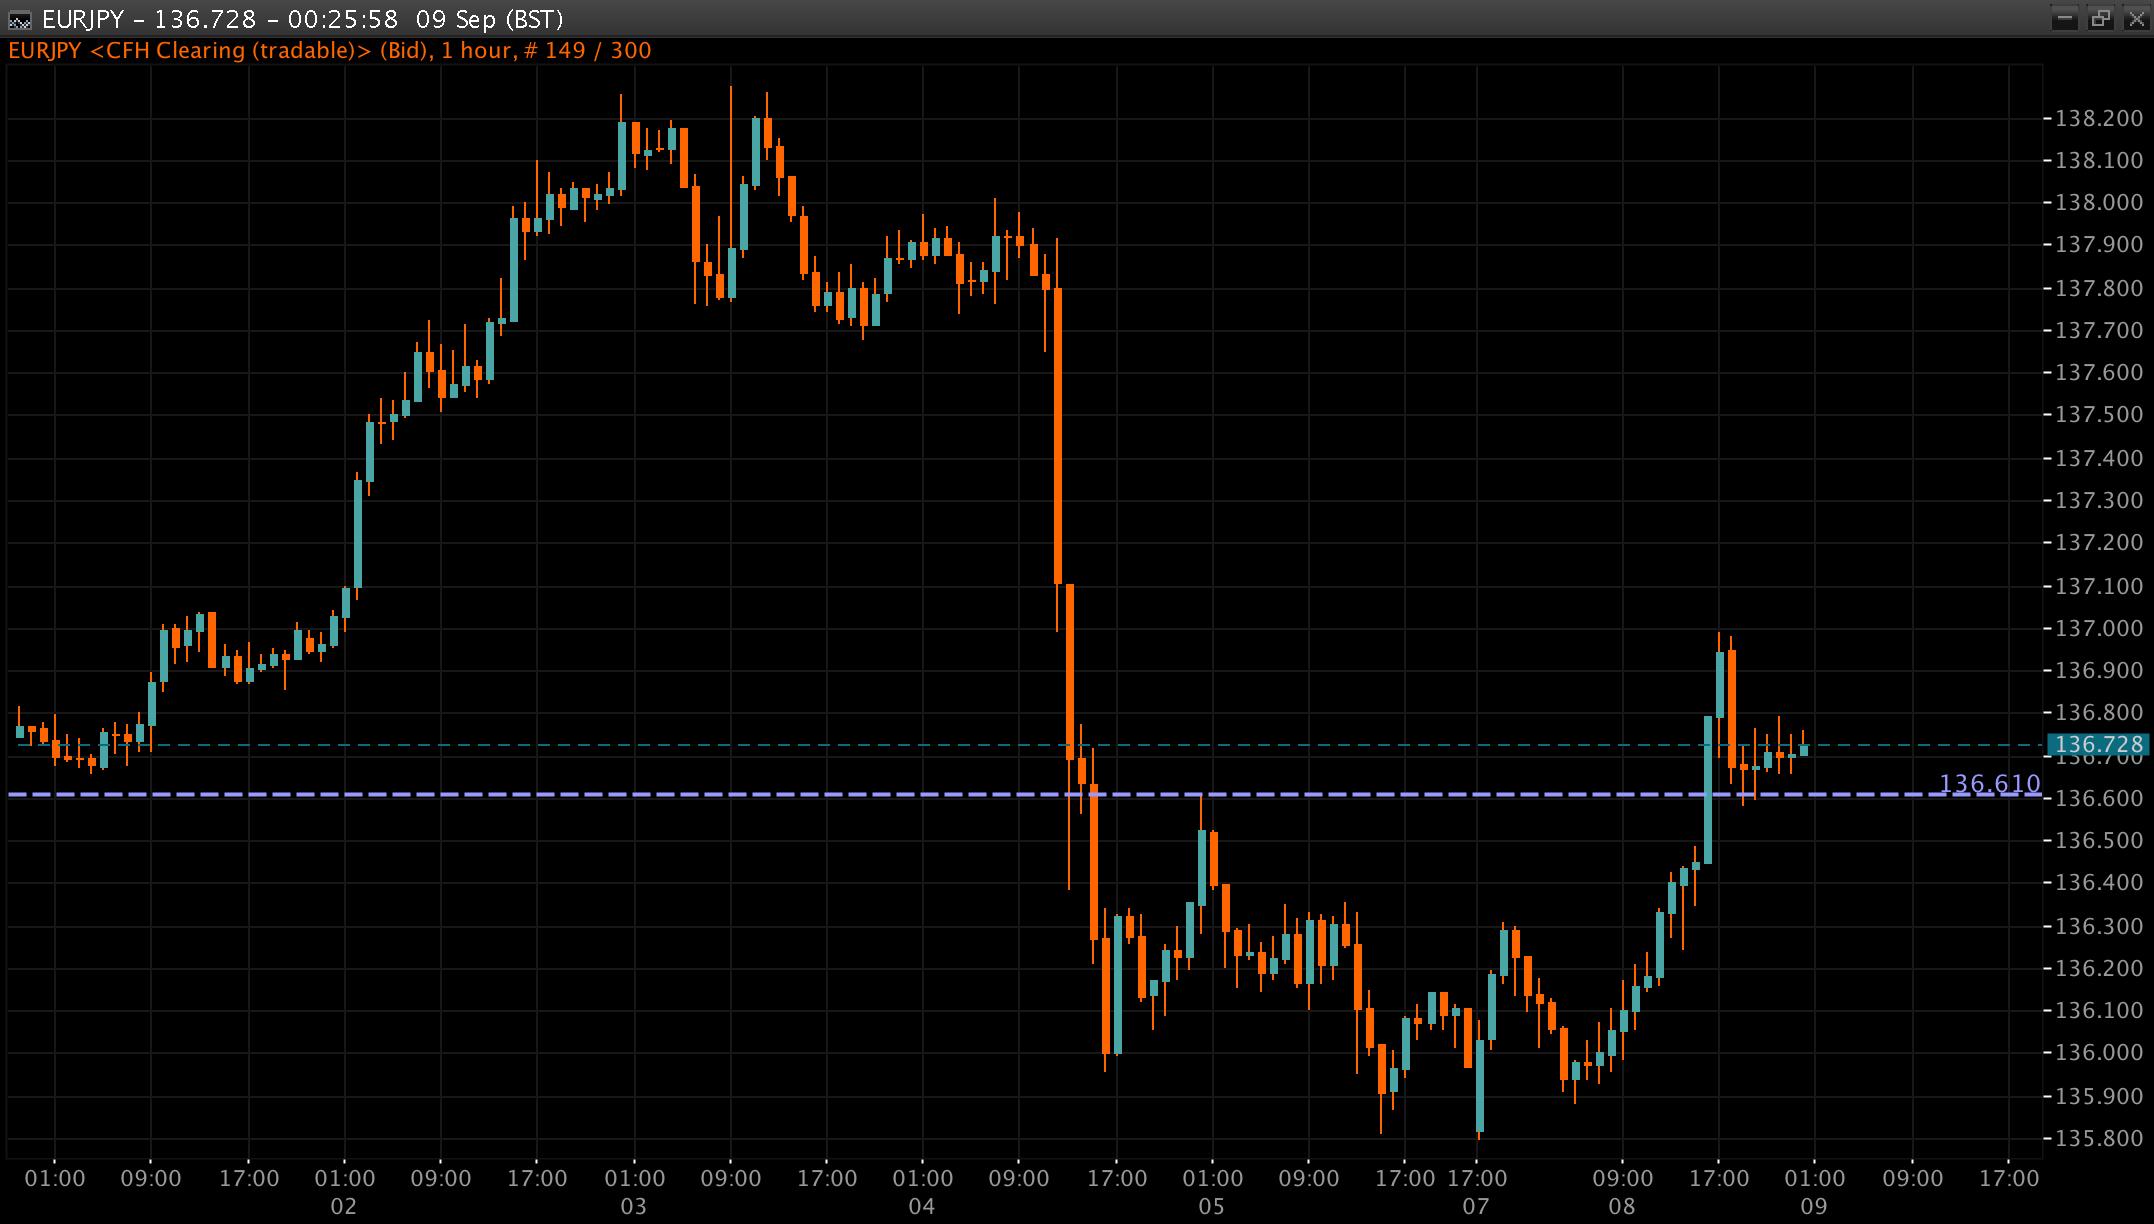 EUR/JPY Chart 09 Sep 2014